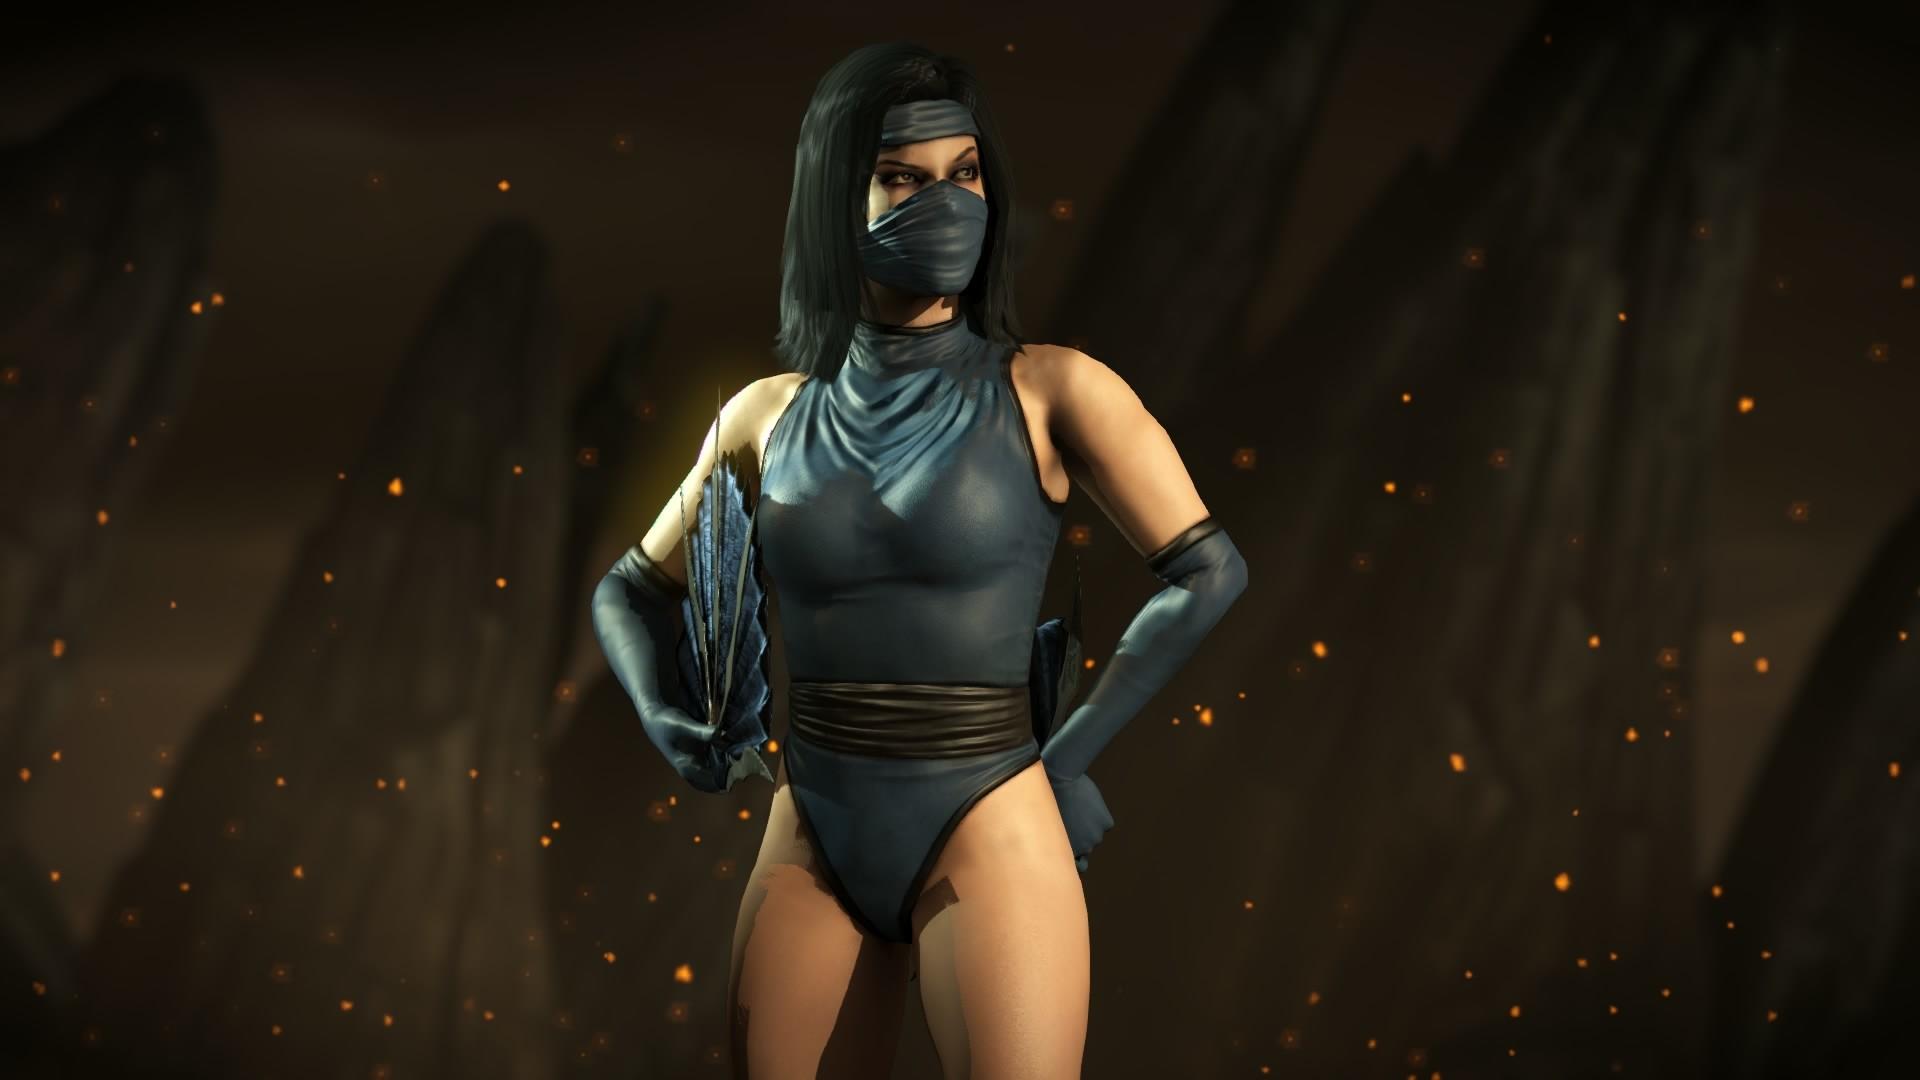 Mortal Kombat X Mileena Wallpaper 82 Images